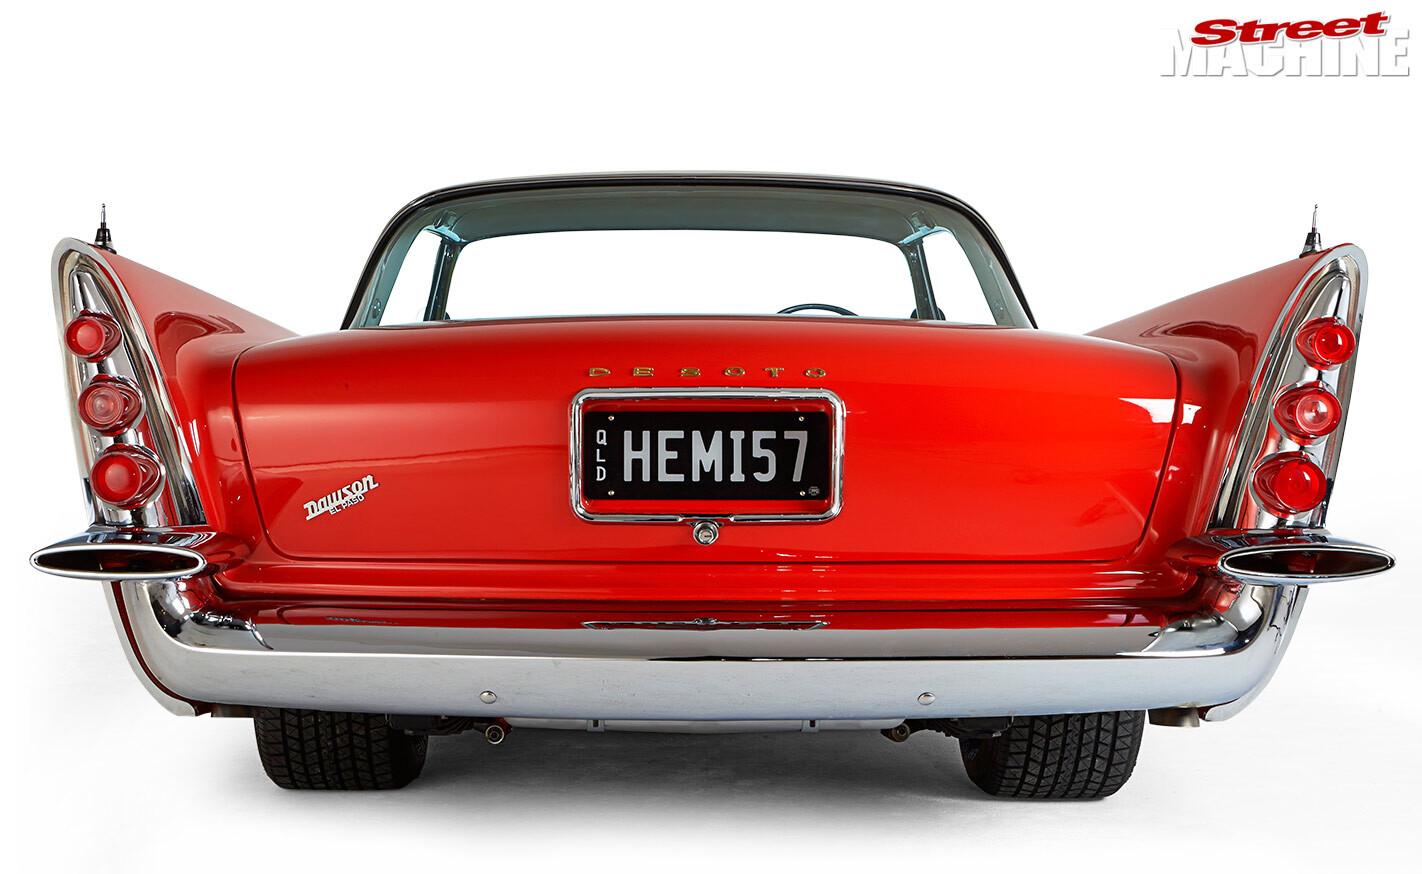 1957 DeSoto Fireflite rear